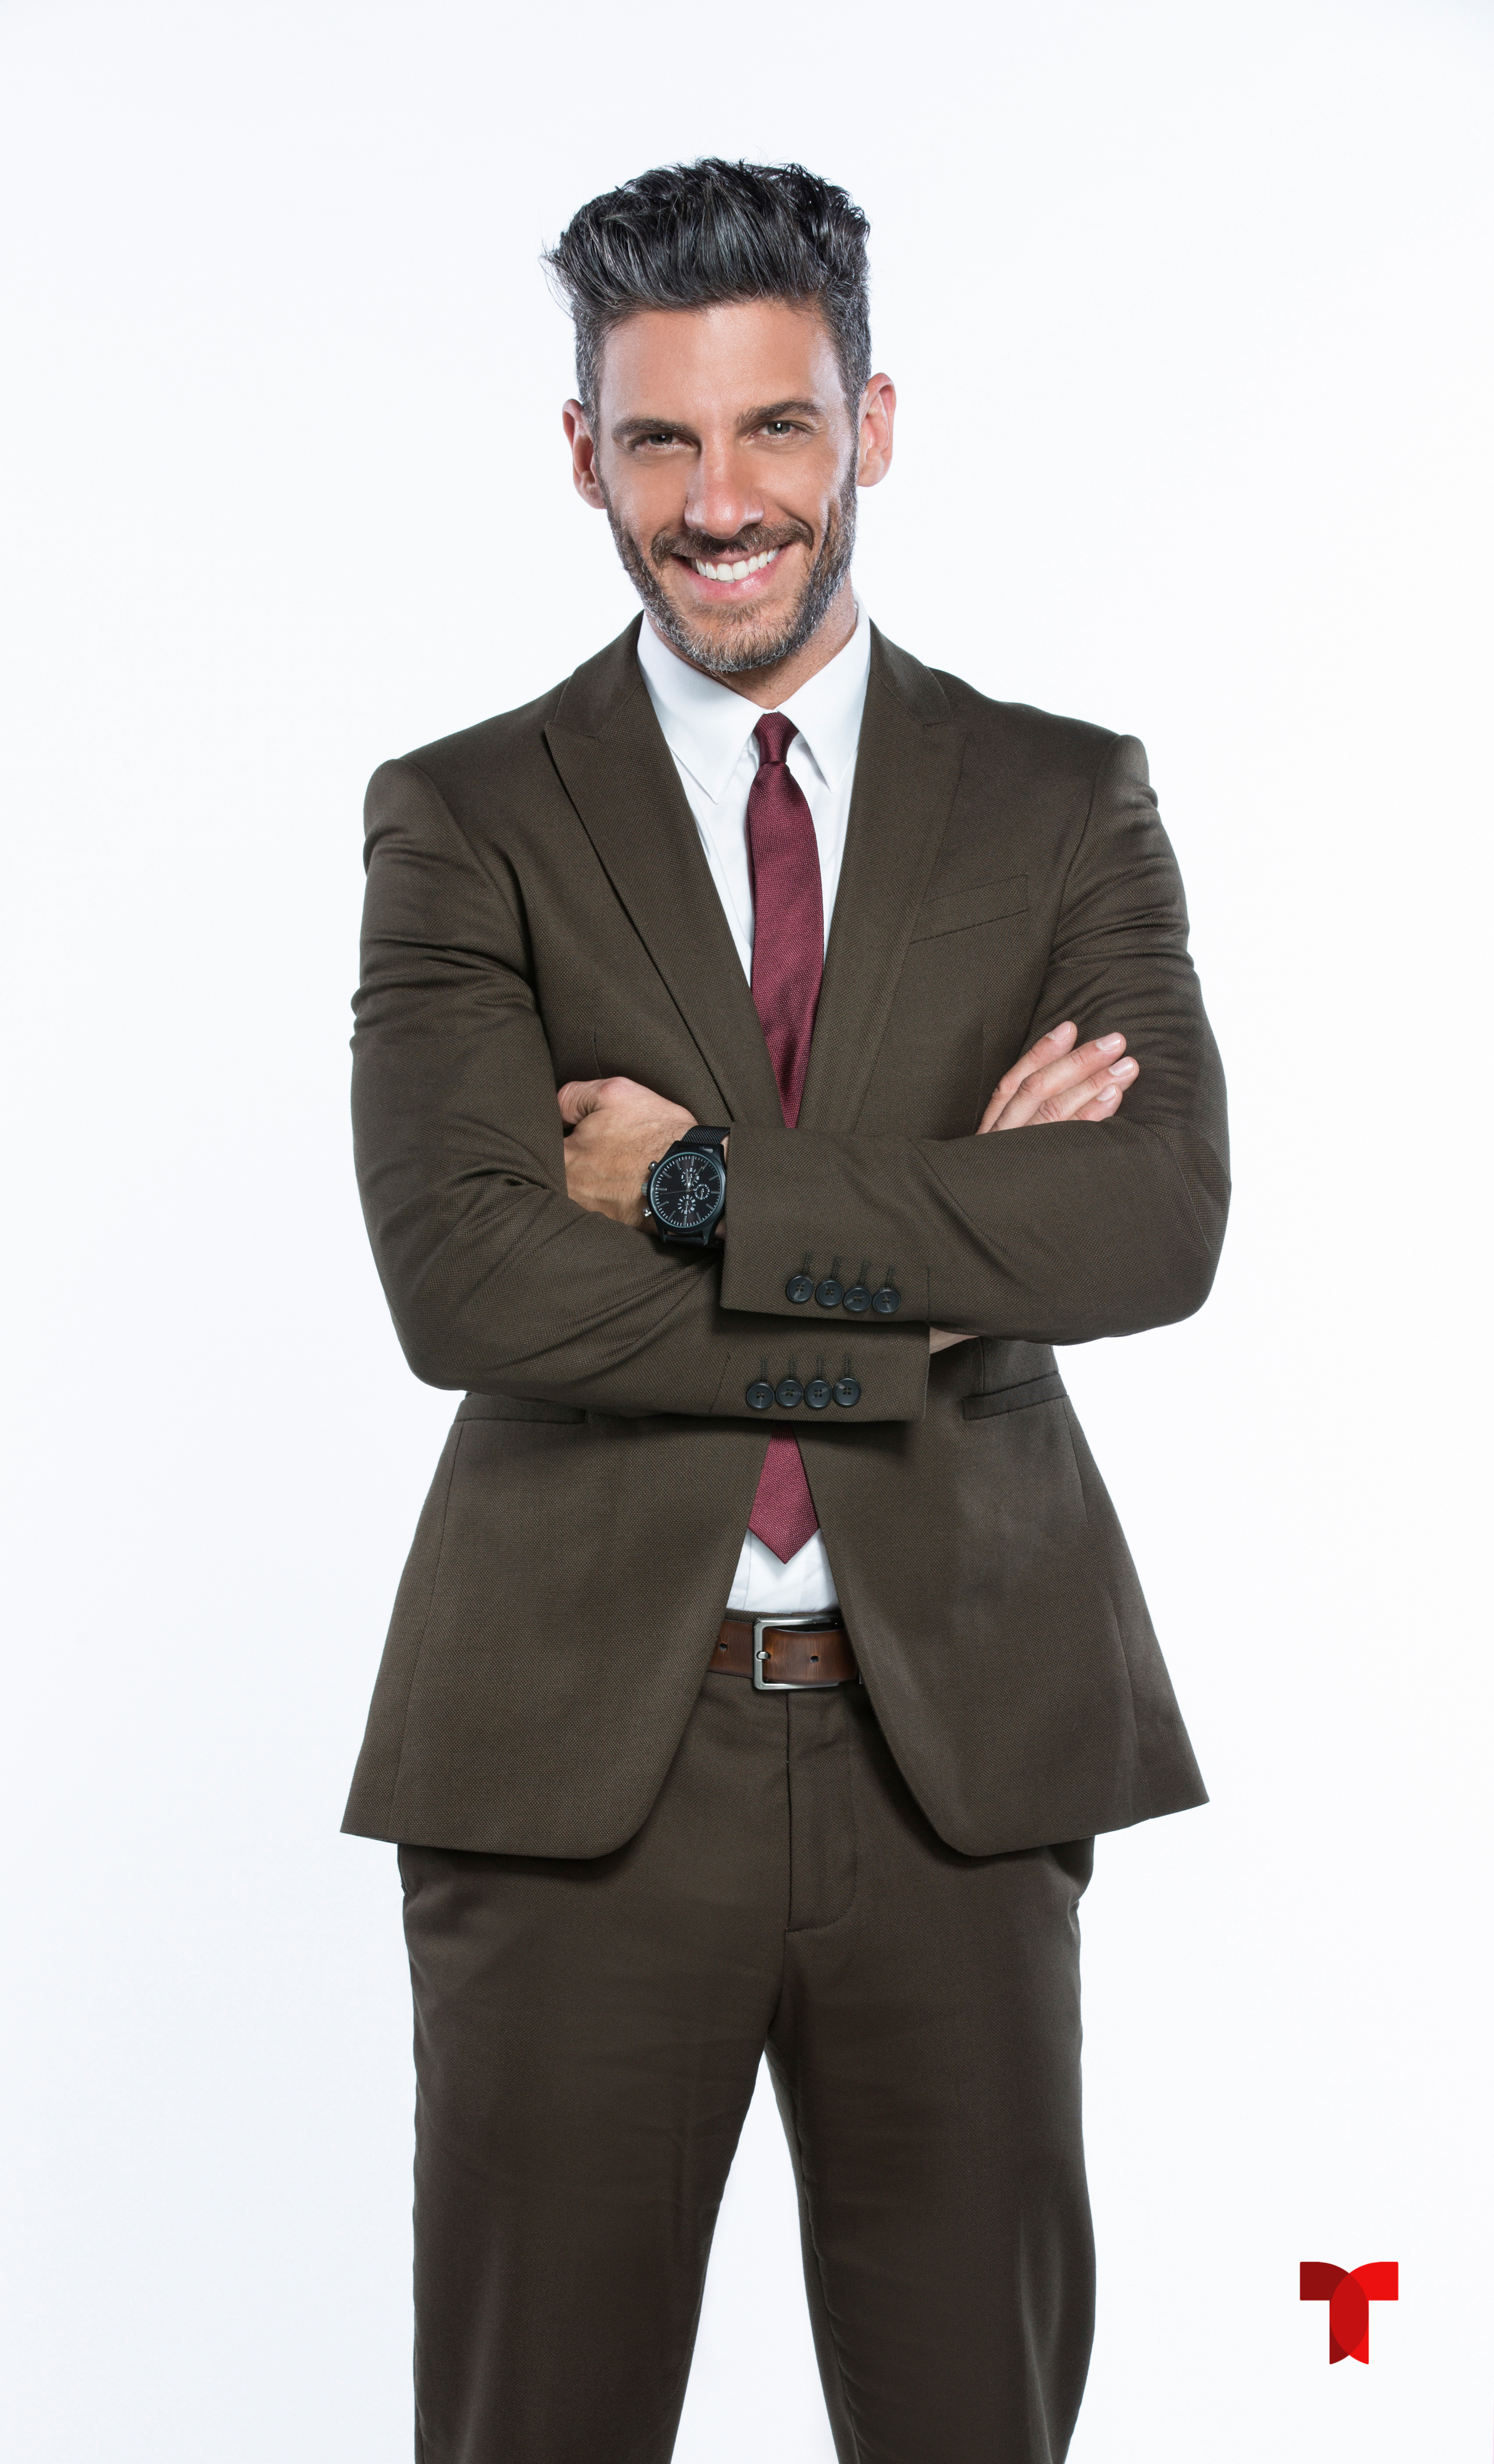 Erick Elias como Armando_003_T copia